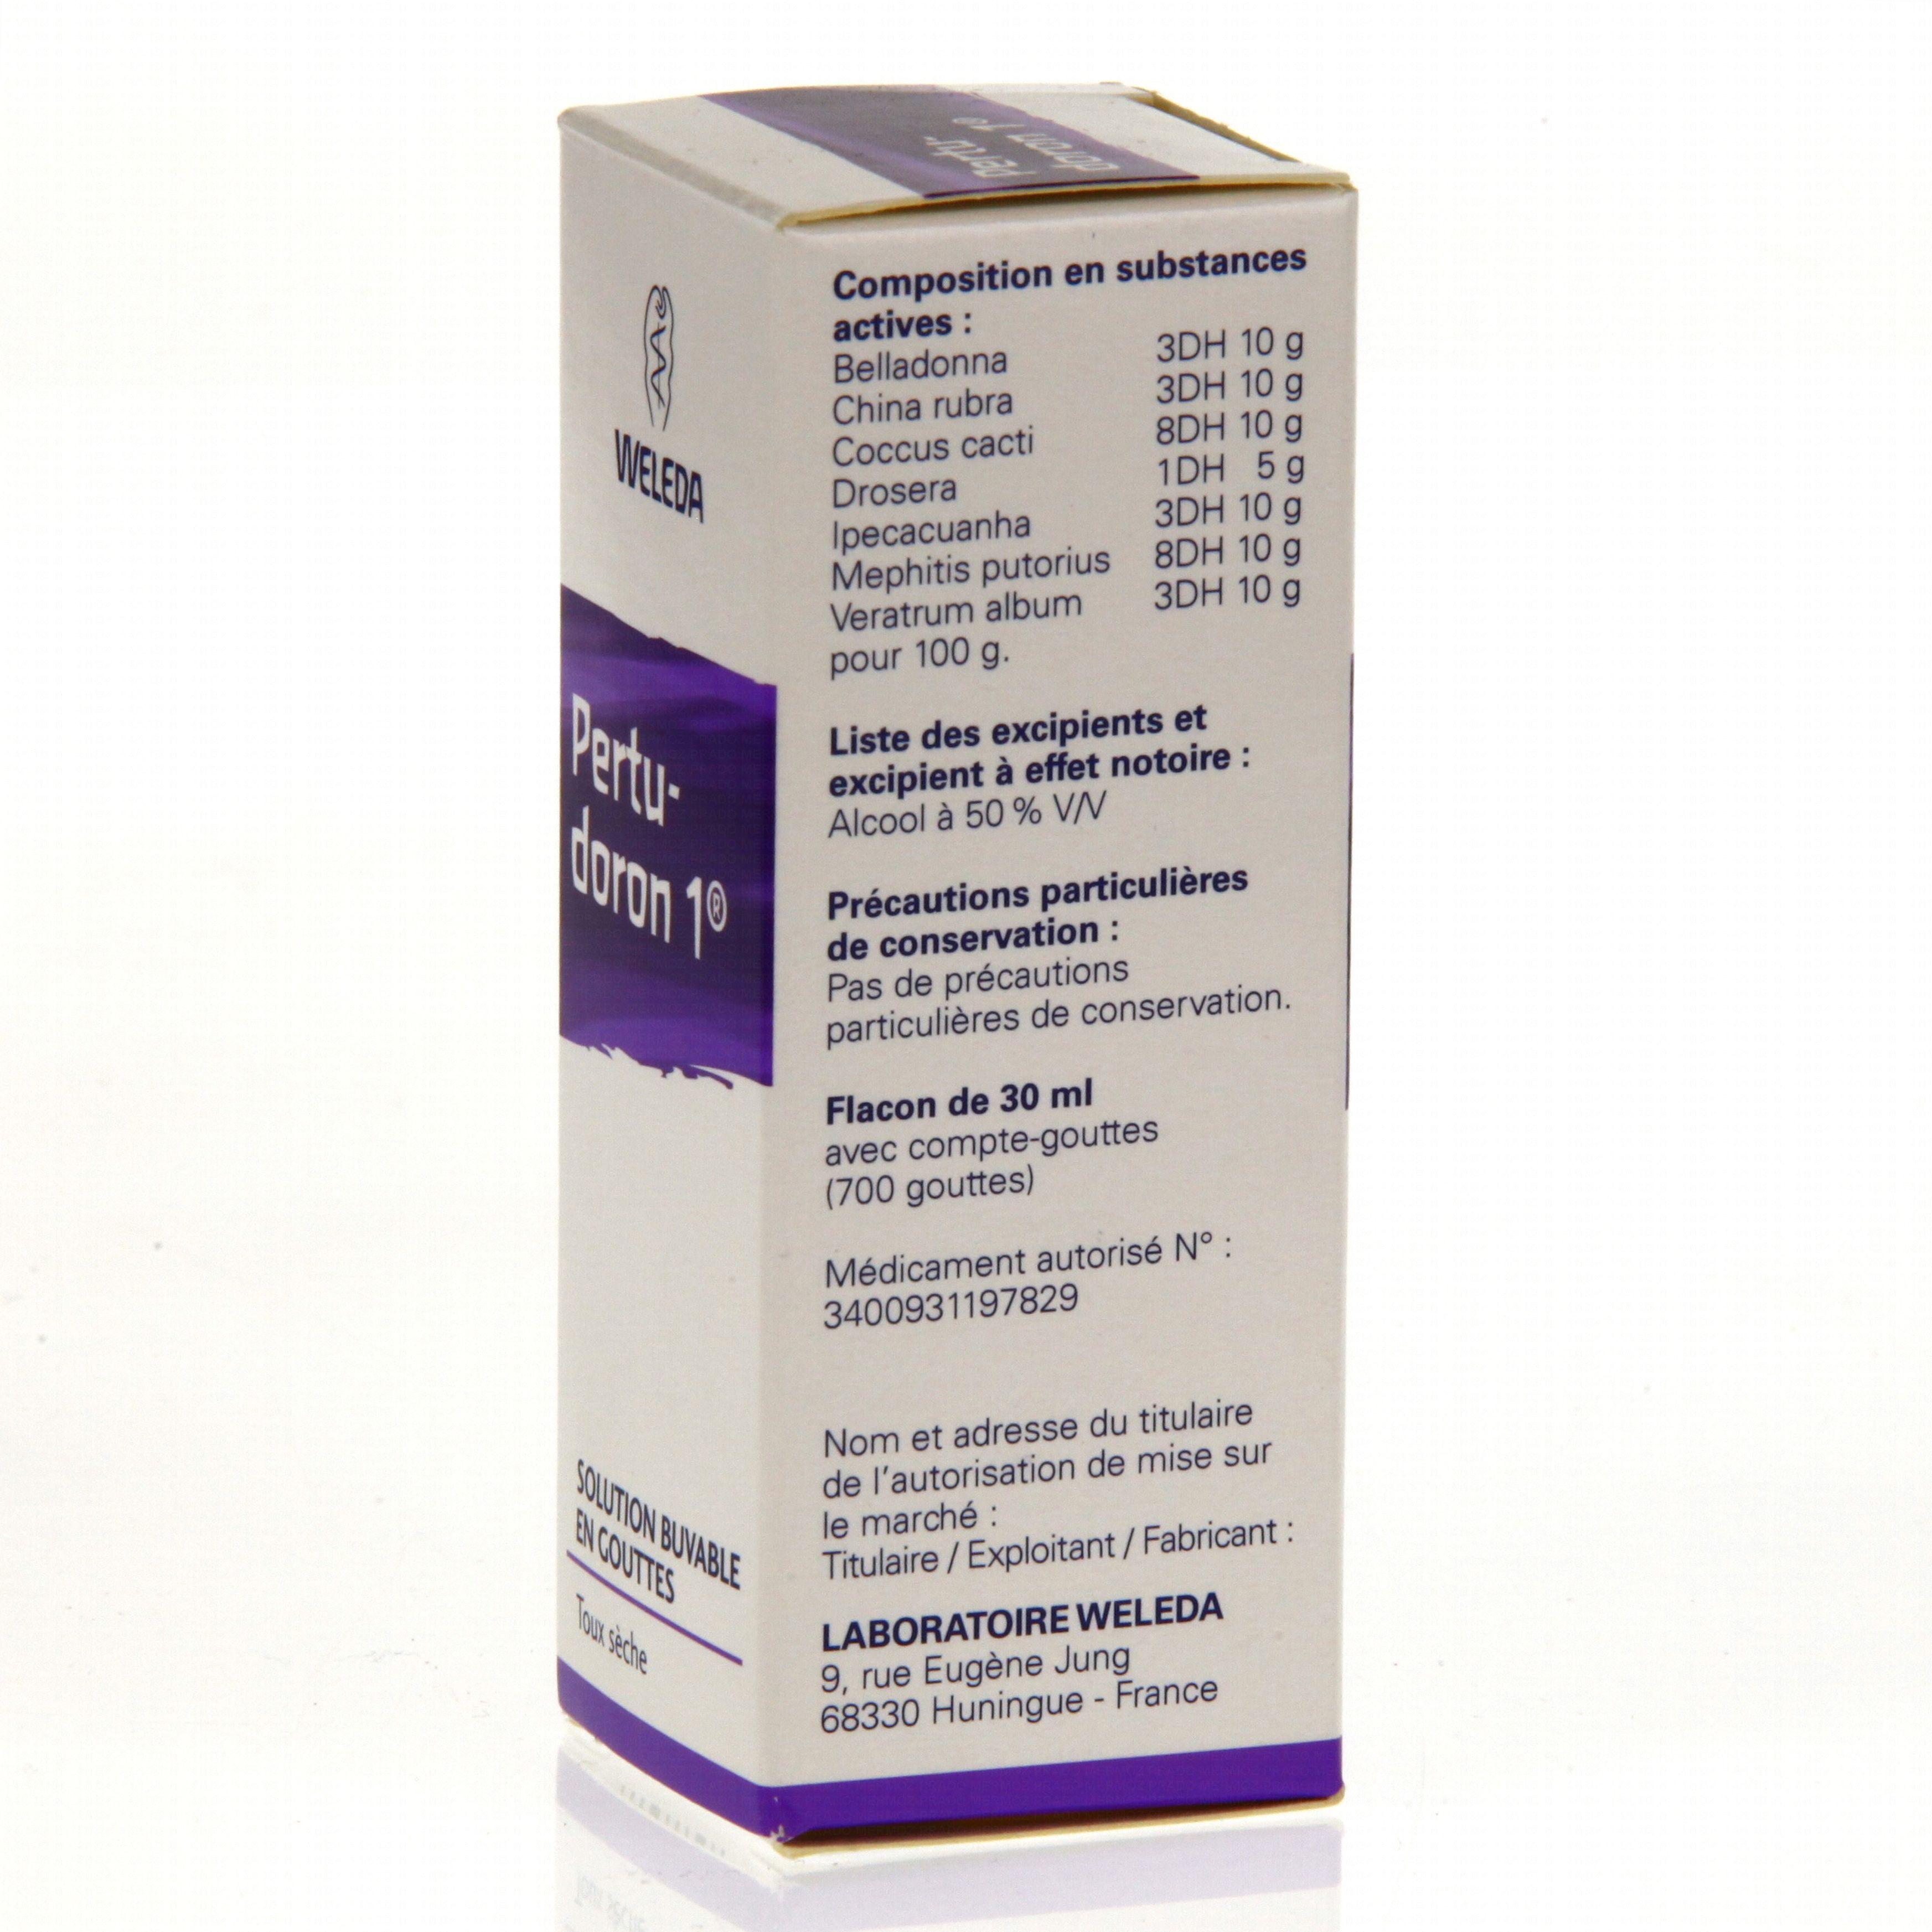 Pertudoron flacon compte-gouttes 30 ml Weleda (médicament